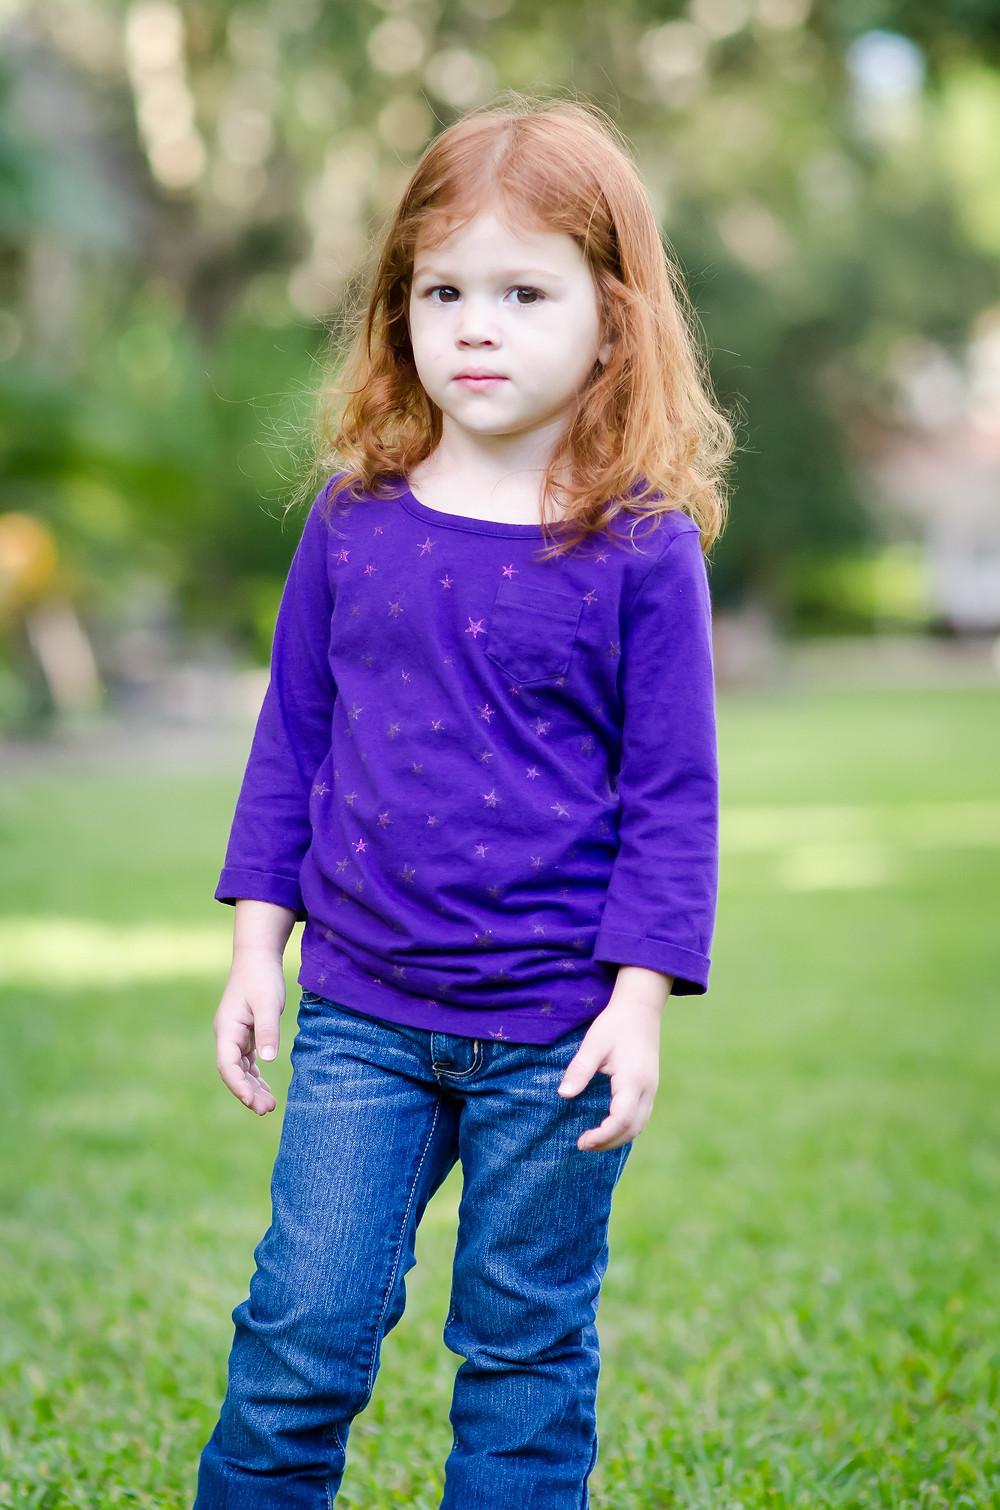 preschool picture